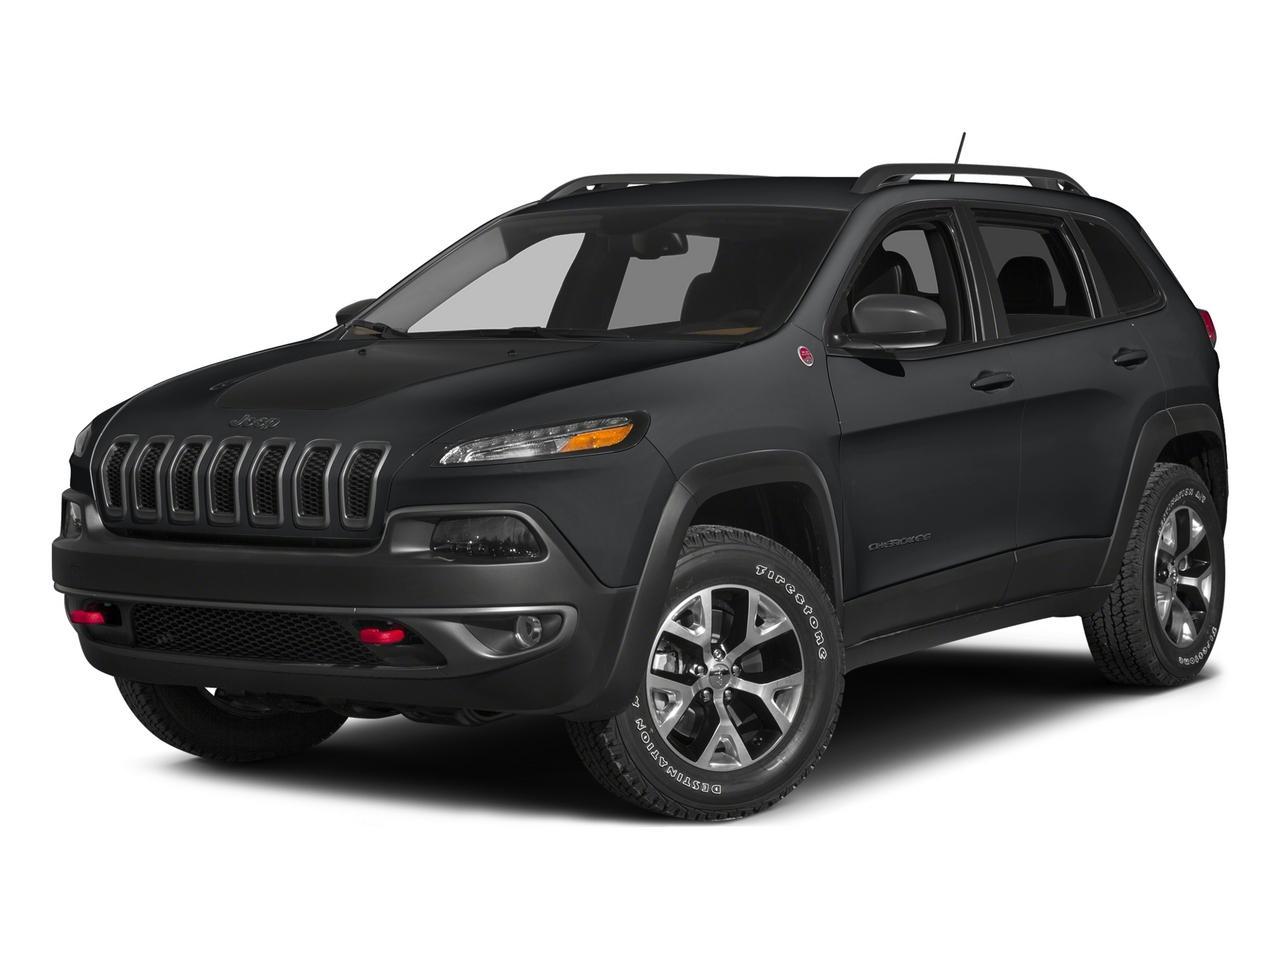 2015 Jeep Cherokee Vehicle Photo in Beaufort, SC 29906